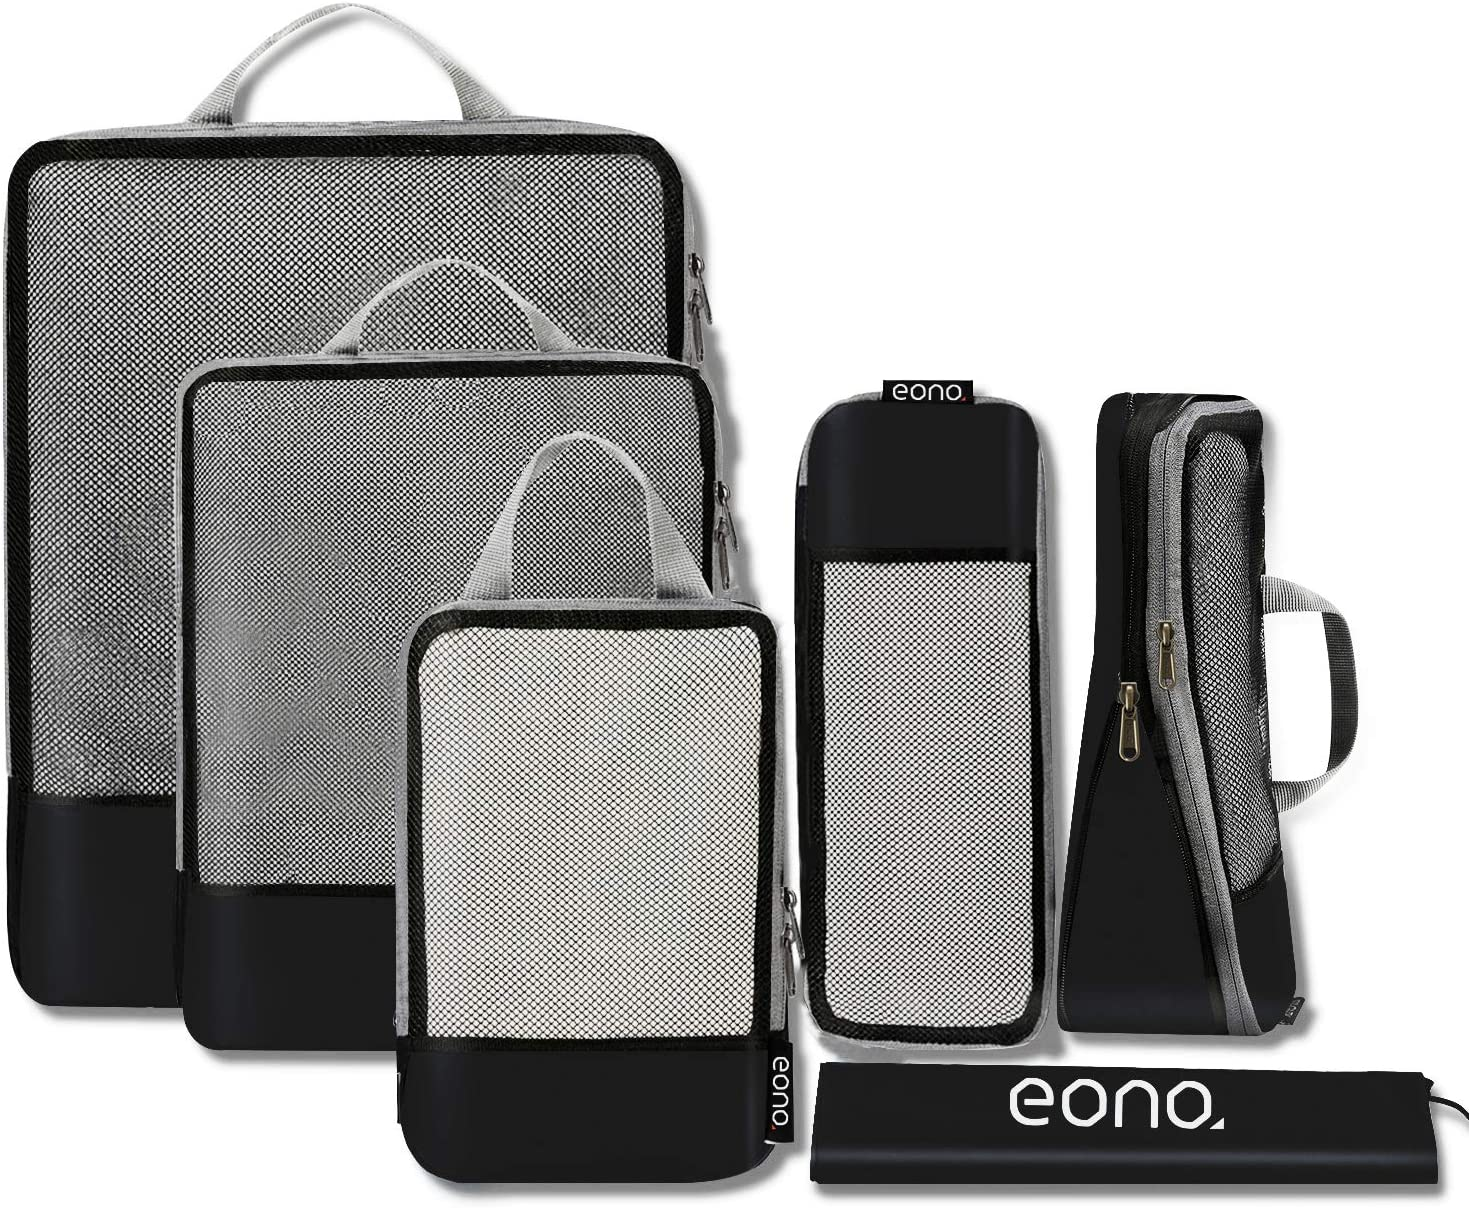 Eono by Amazon - Organizadores de Viaje de compresión expandibles, Impermeable Organizador para Maletas, Organizador de Equipaje, Cubos de Embalaje, Compression Packing Cubes, Negro, 6 Set